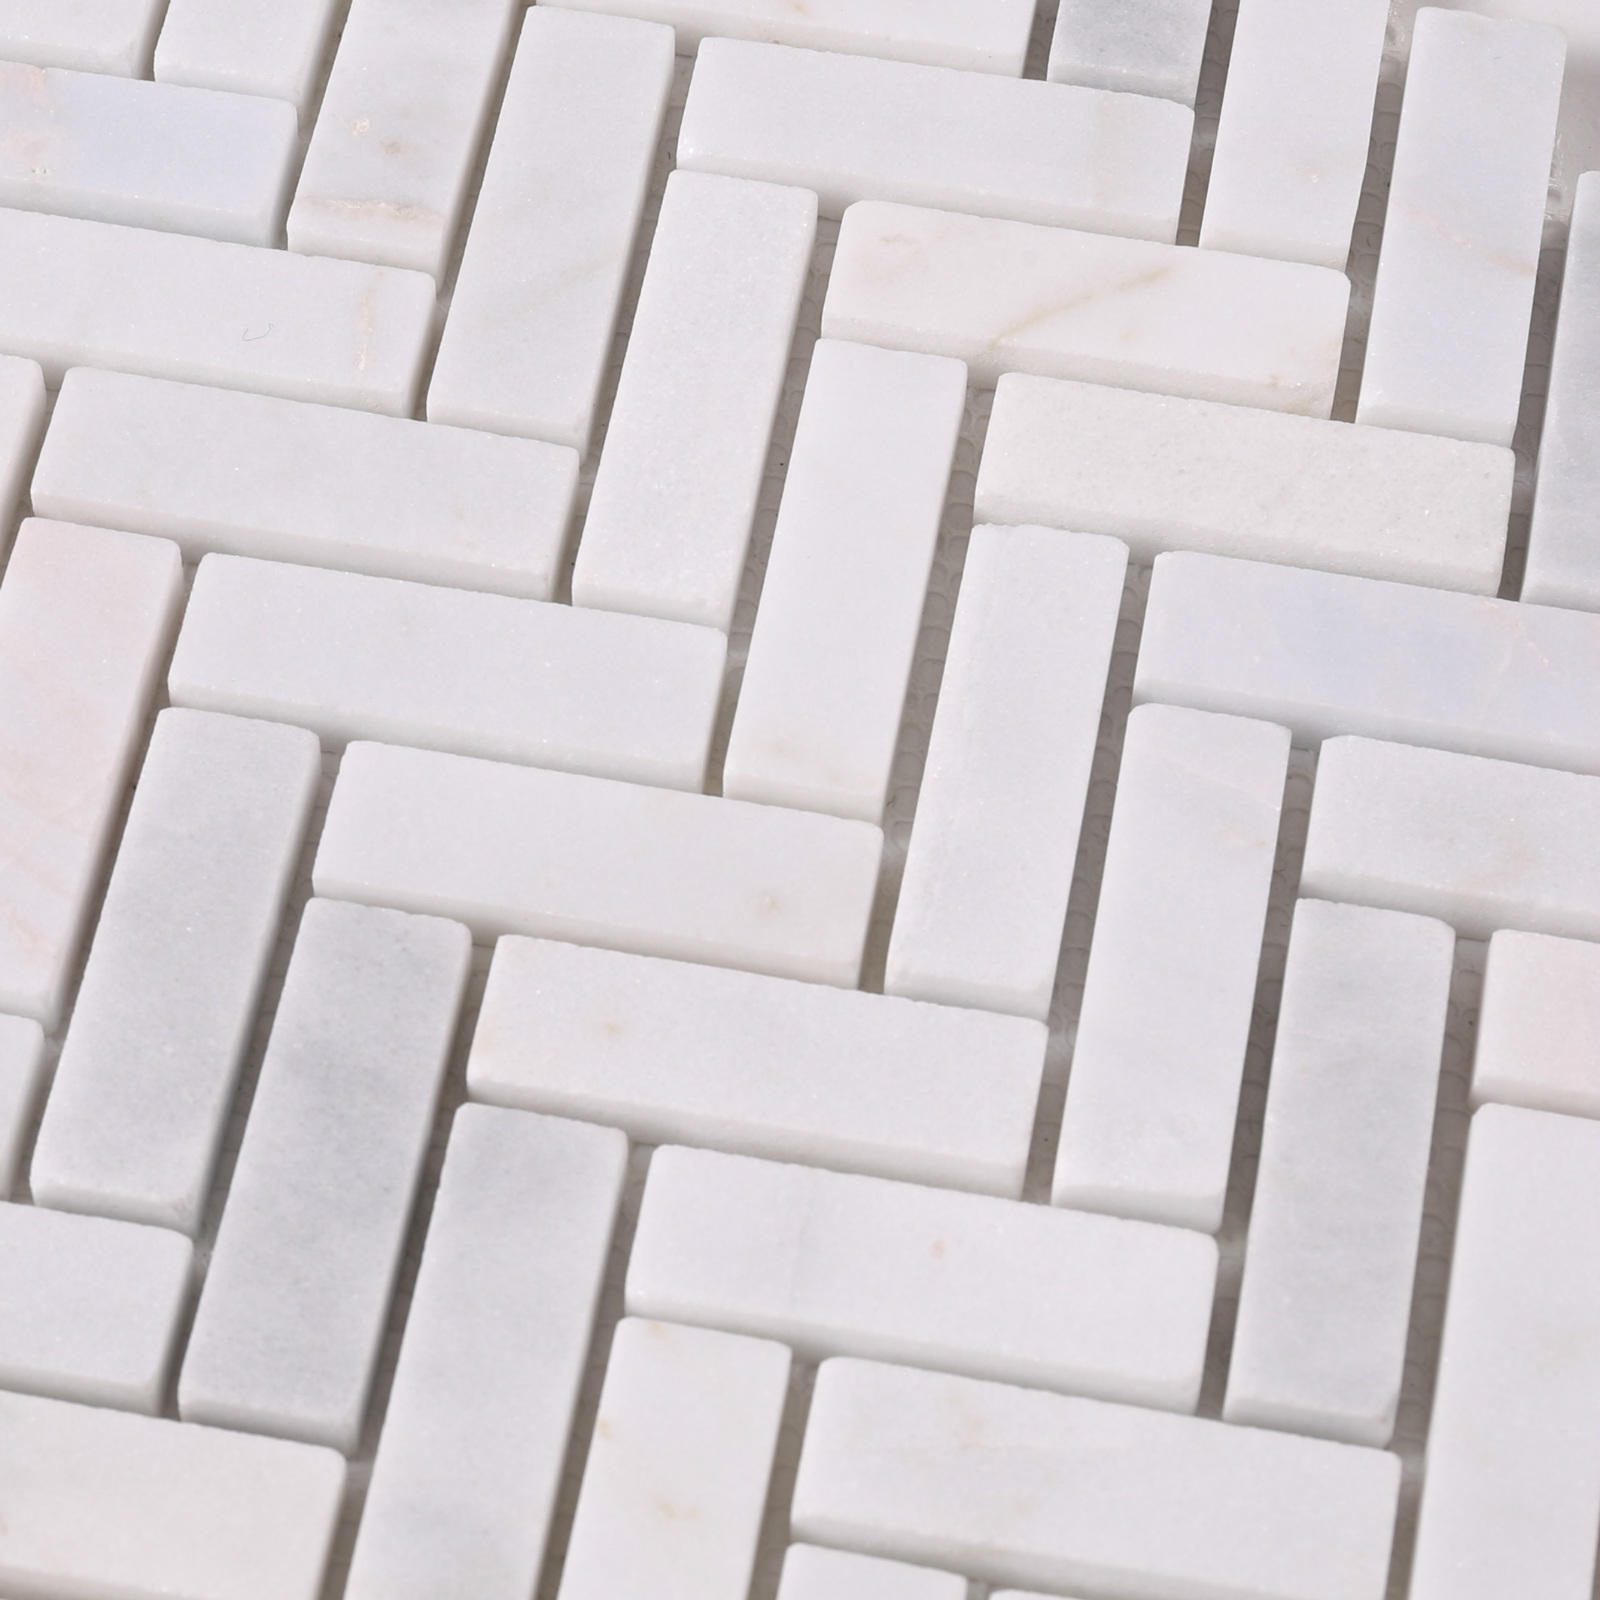 Heng Xing-stone tile ,natural stone mosaic tile sheets | Heng Xing-2